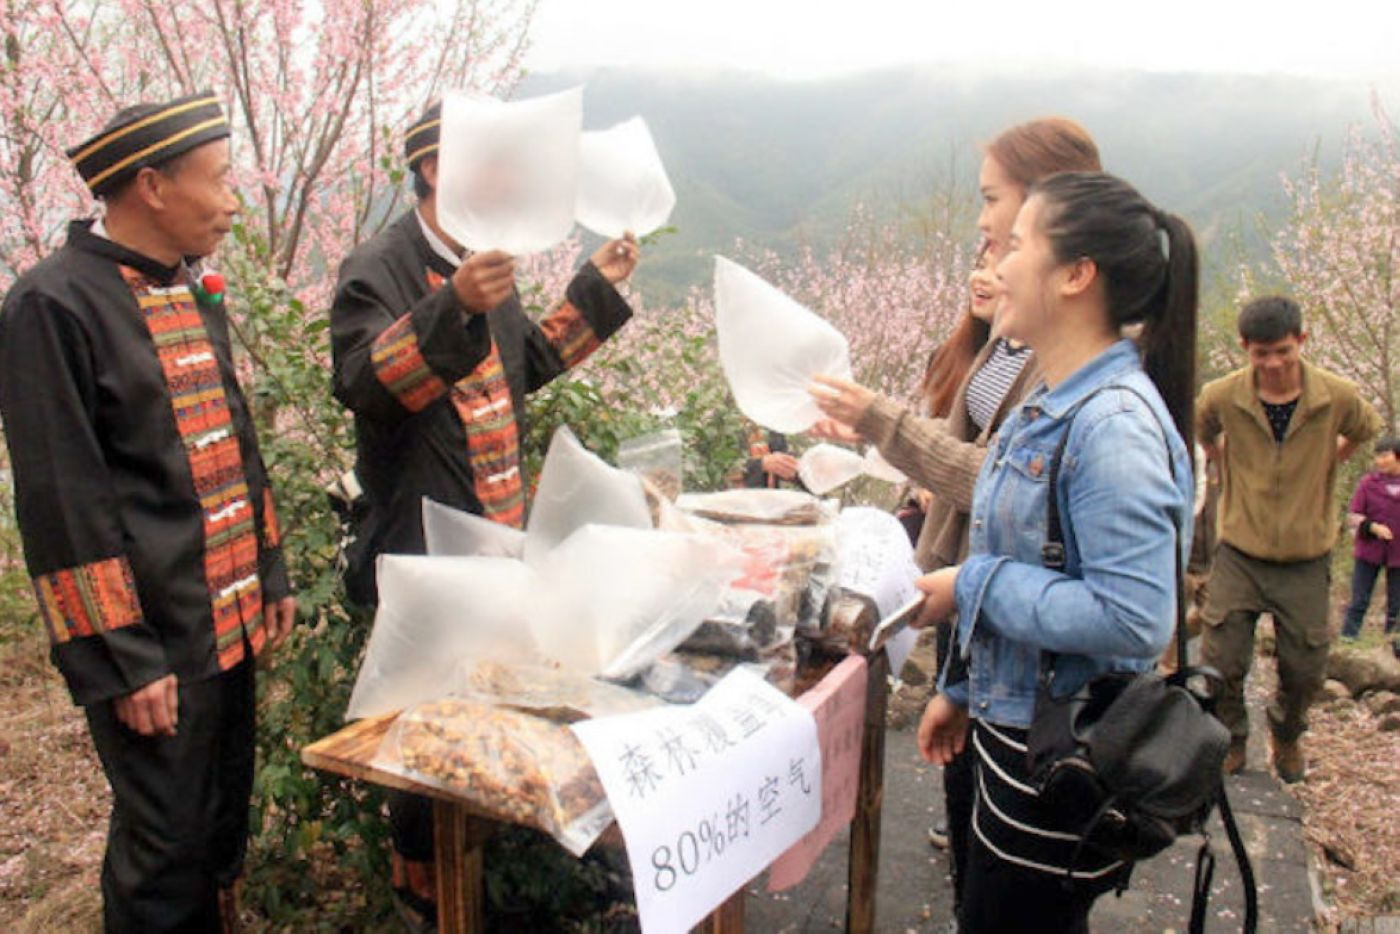 08-Fresh-air-bags-in-China.jpg